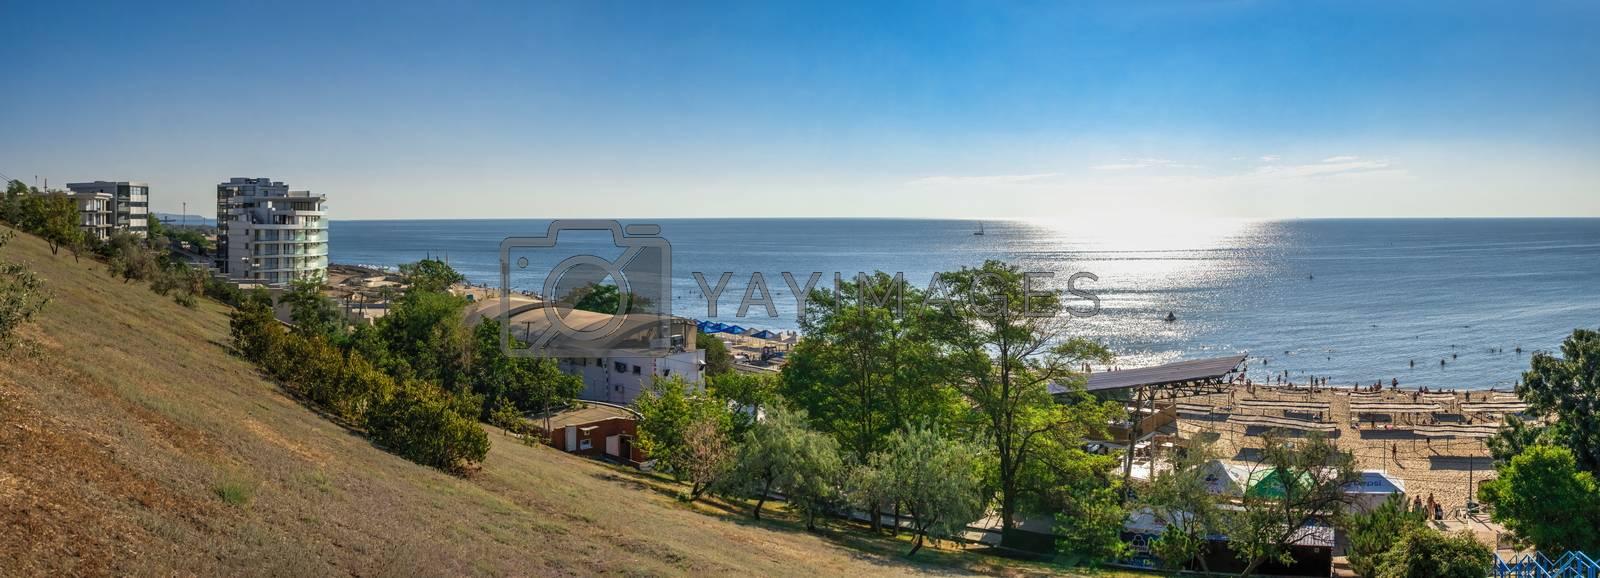 Royalty free image of Public beach in Chernomorsk, Ukraine by Multipedia